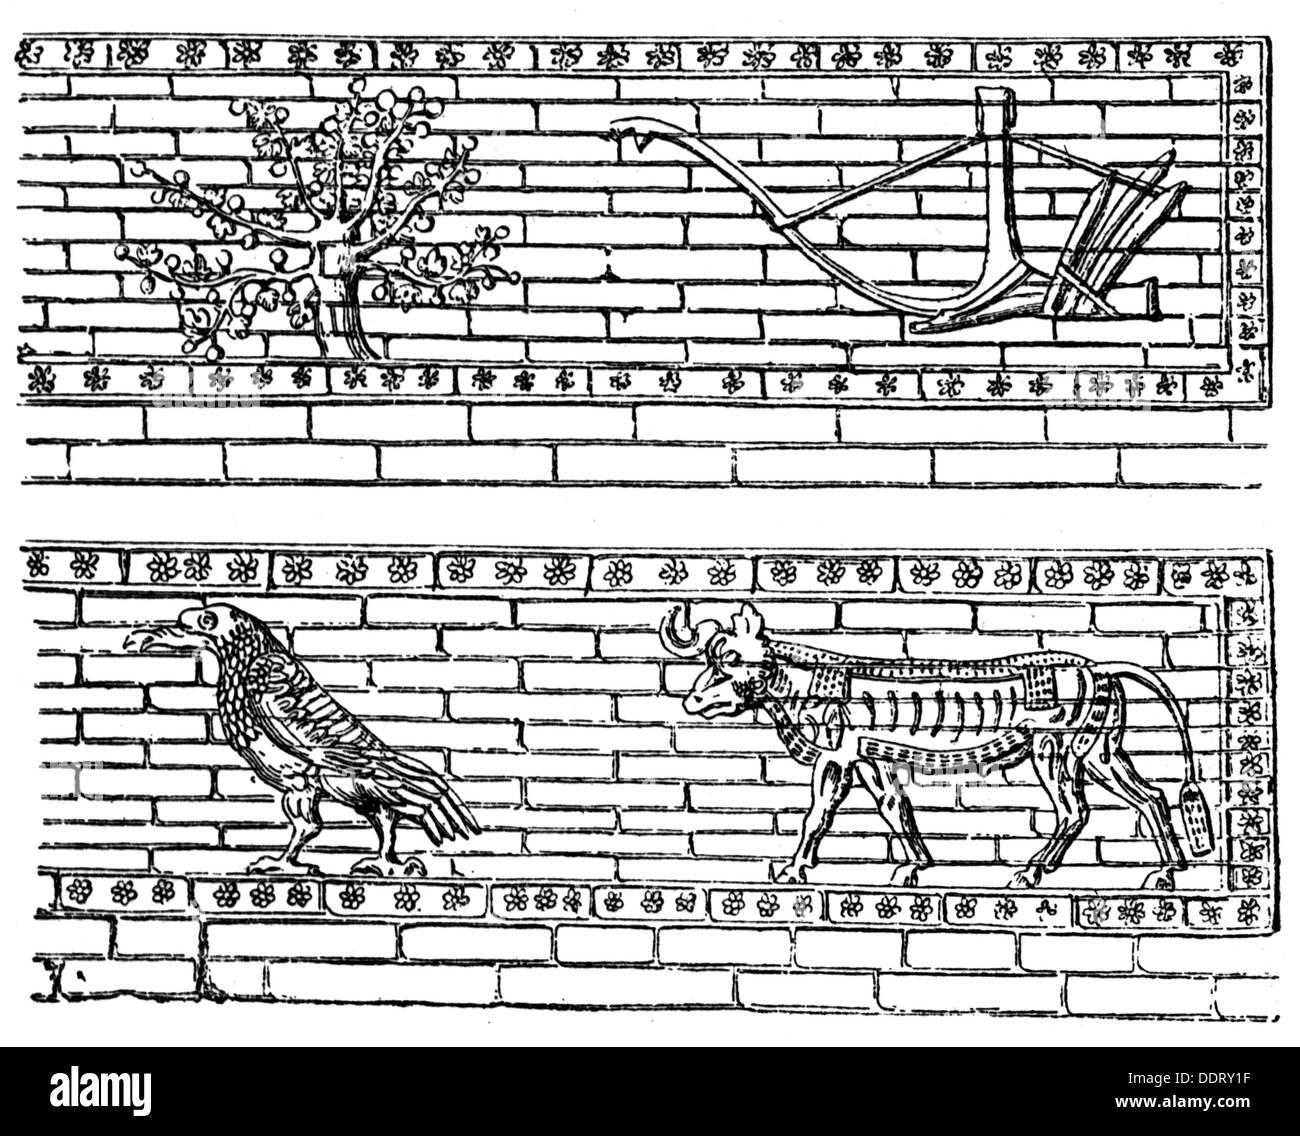 ancient world, Assyria, fine arts, mosaic, palace of King Sargon II, Dur Shurrukin, Iraq, 712 - 706 BC, wood engraving, 19th century, Additional-Rights-Clearances-NA - Stock Image